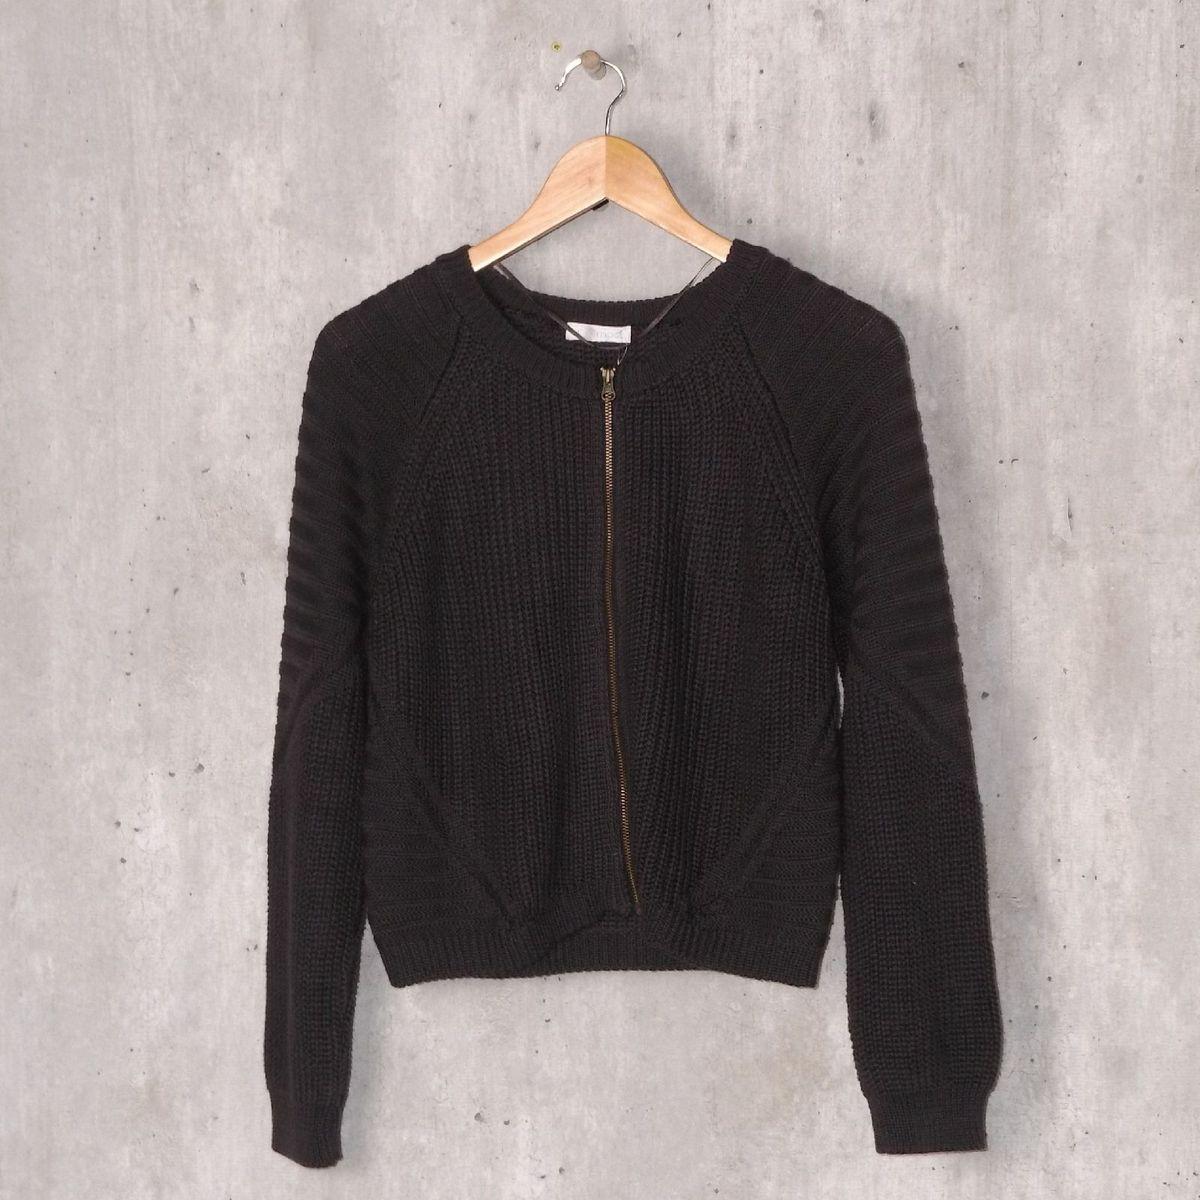 pullover lã promod - casaquinhos promod